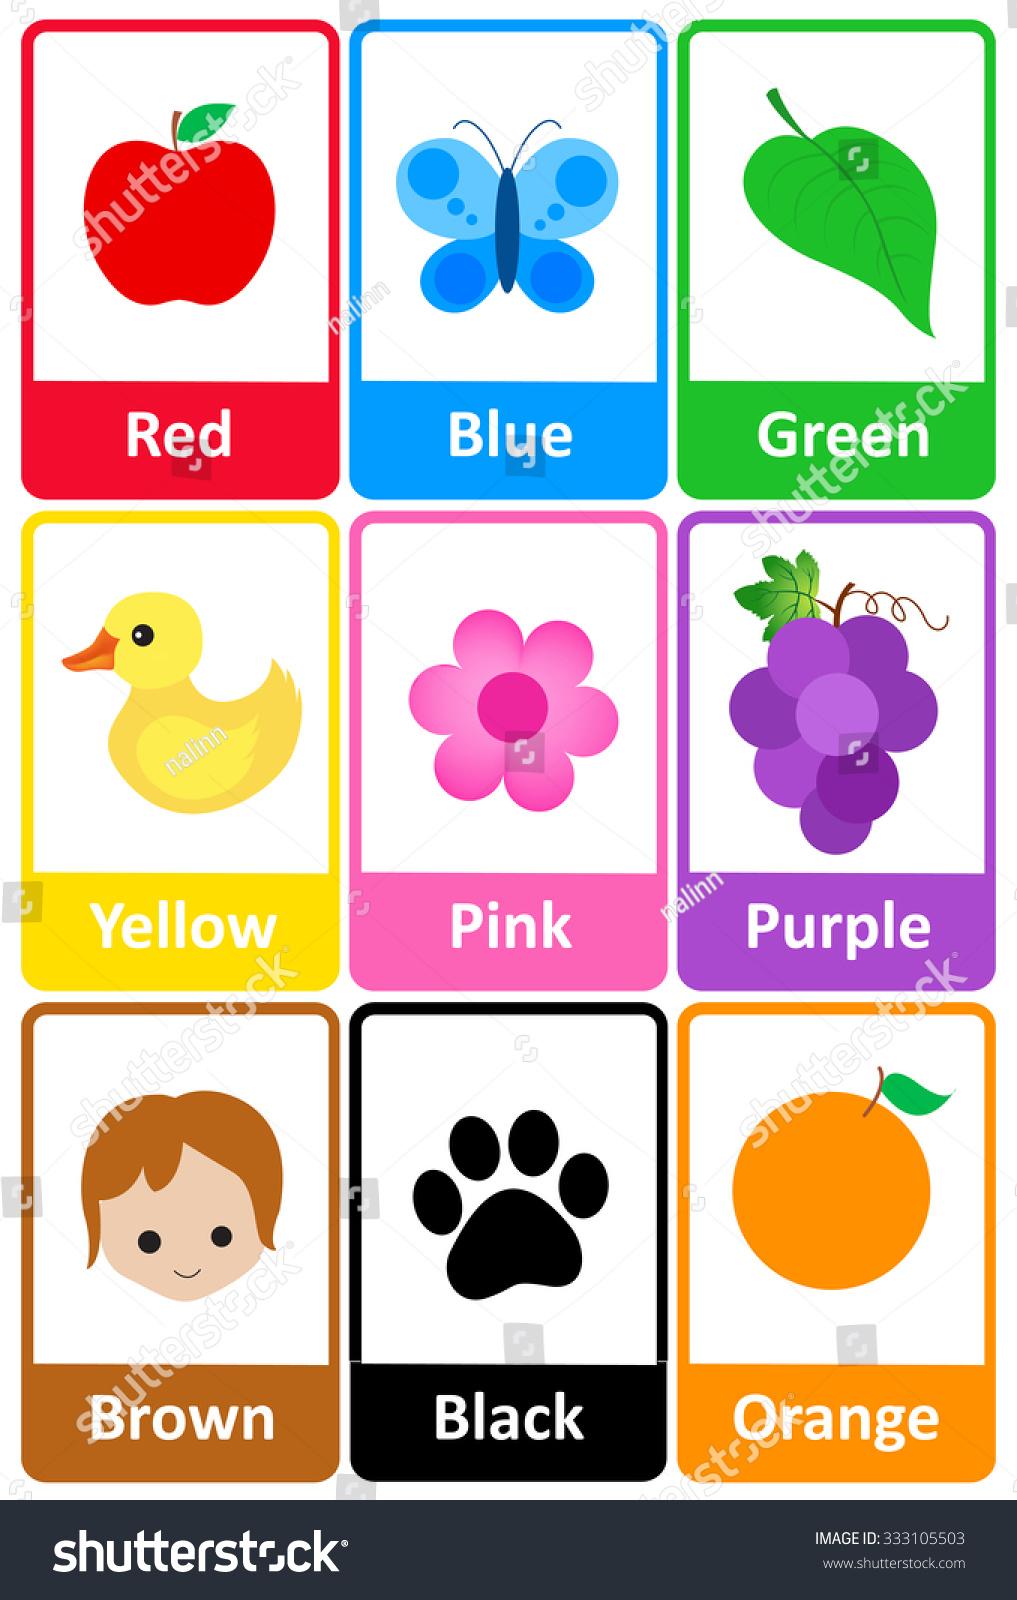 Color cards for kids - Color Cards For Kids 1